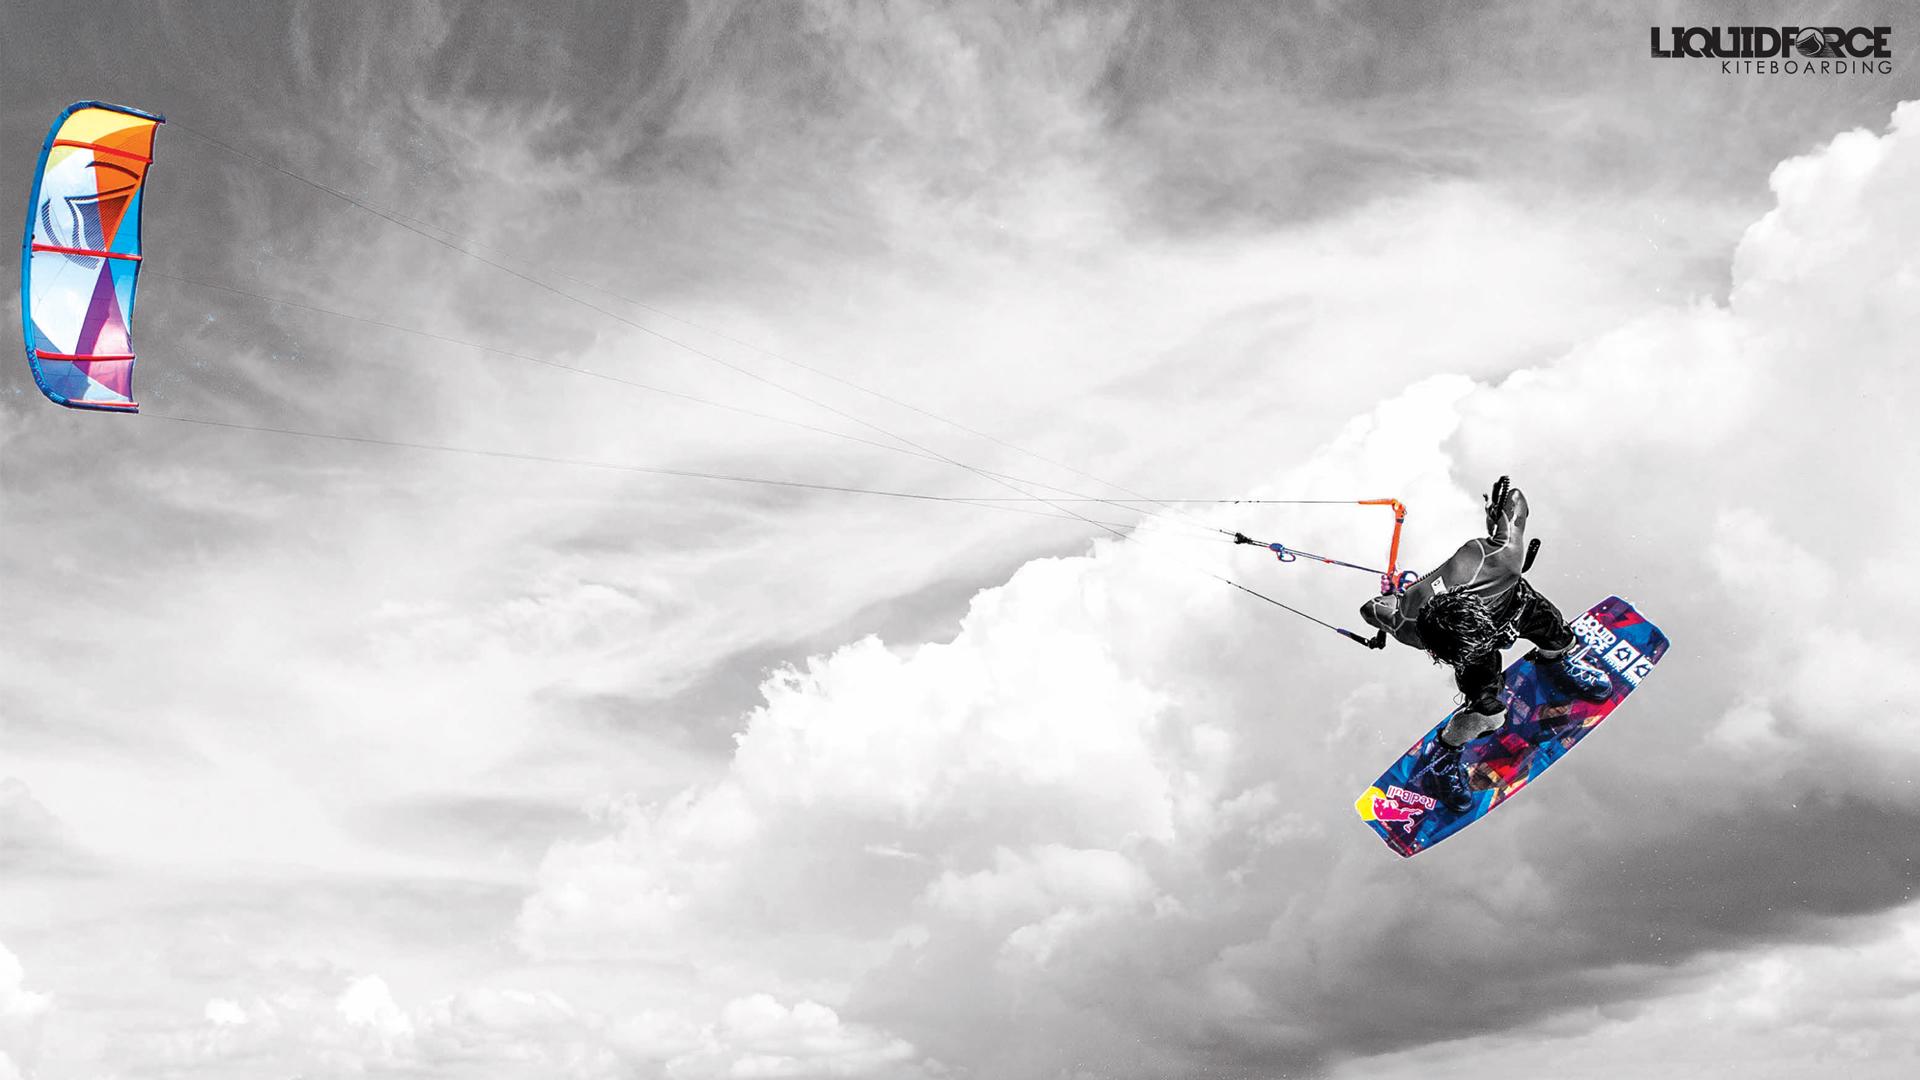 Download Liquid Force Kiteboarding wallpaper Christophe Tack 1920x1080